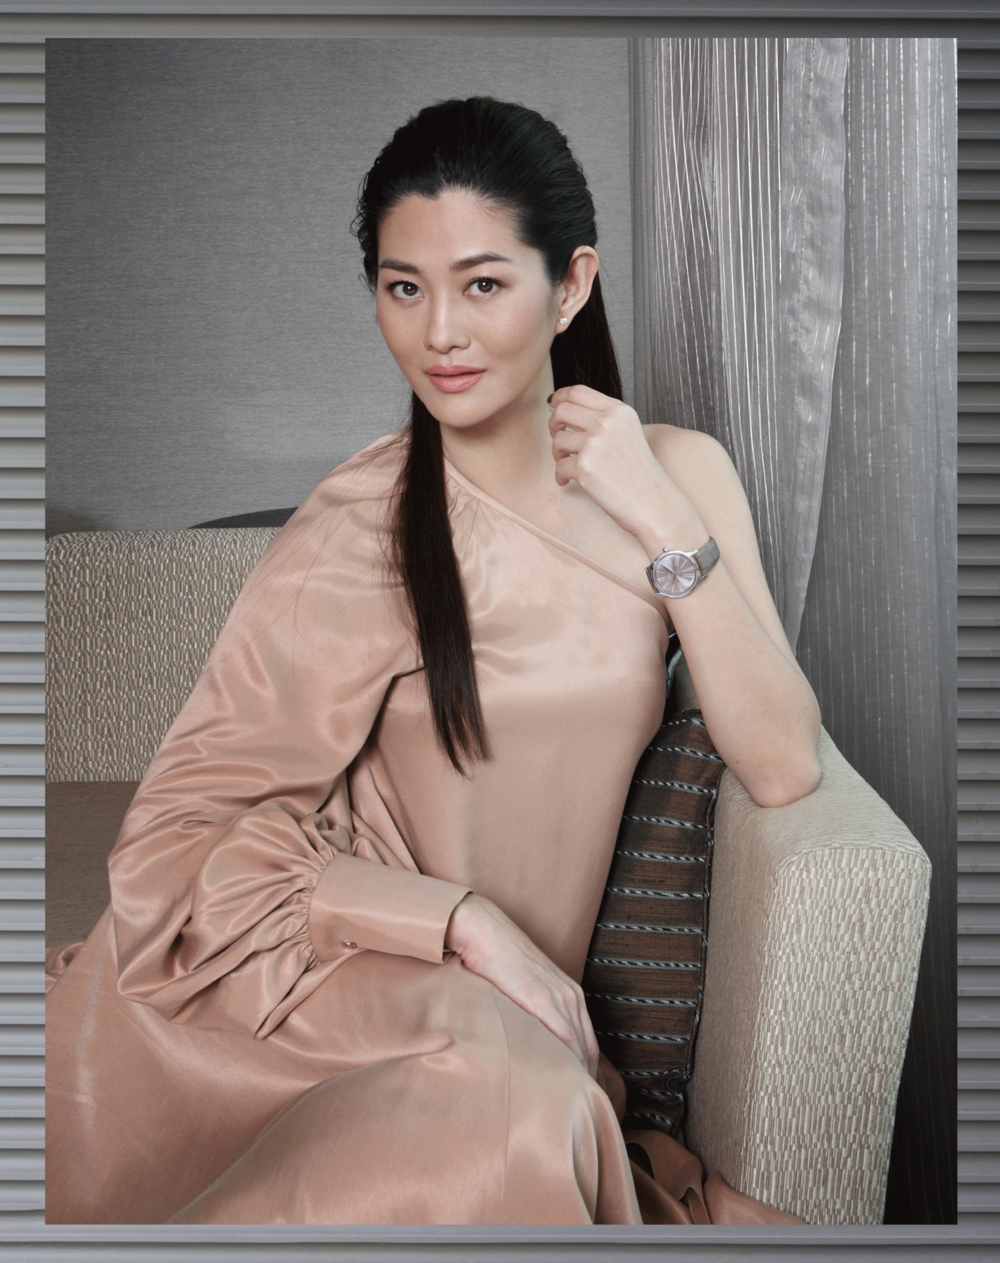 Suquan ; dress : ASAVA / watch : OMEGA Tresor Collection 39mm.